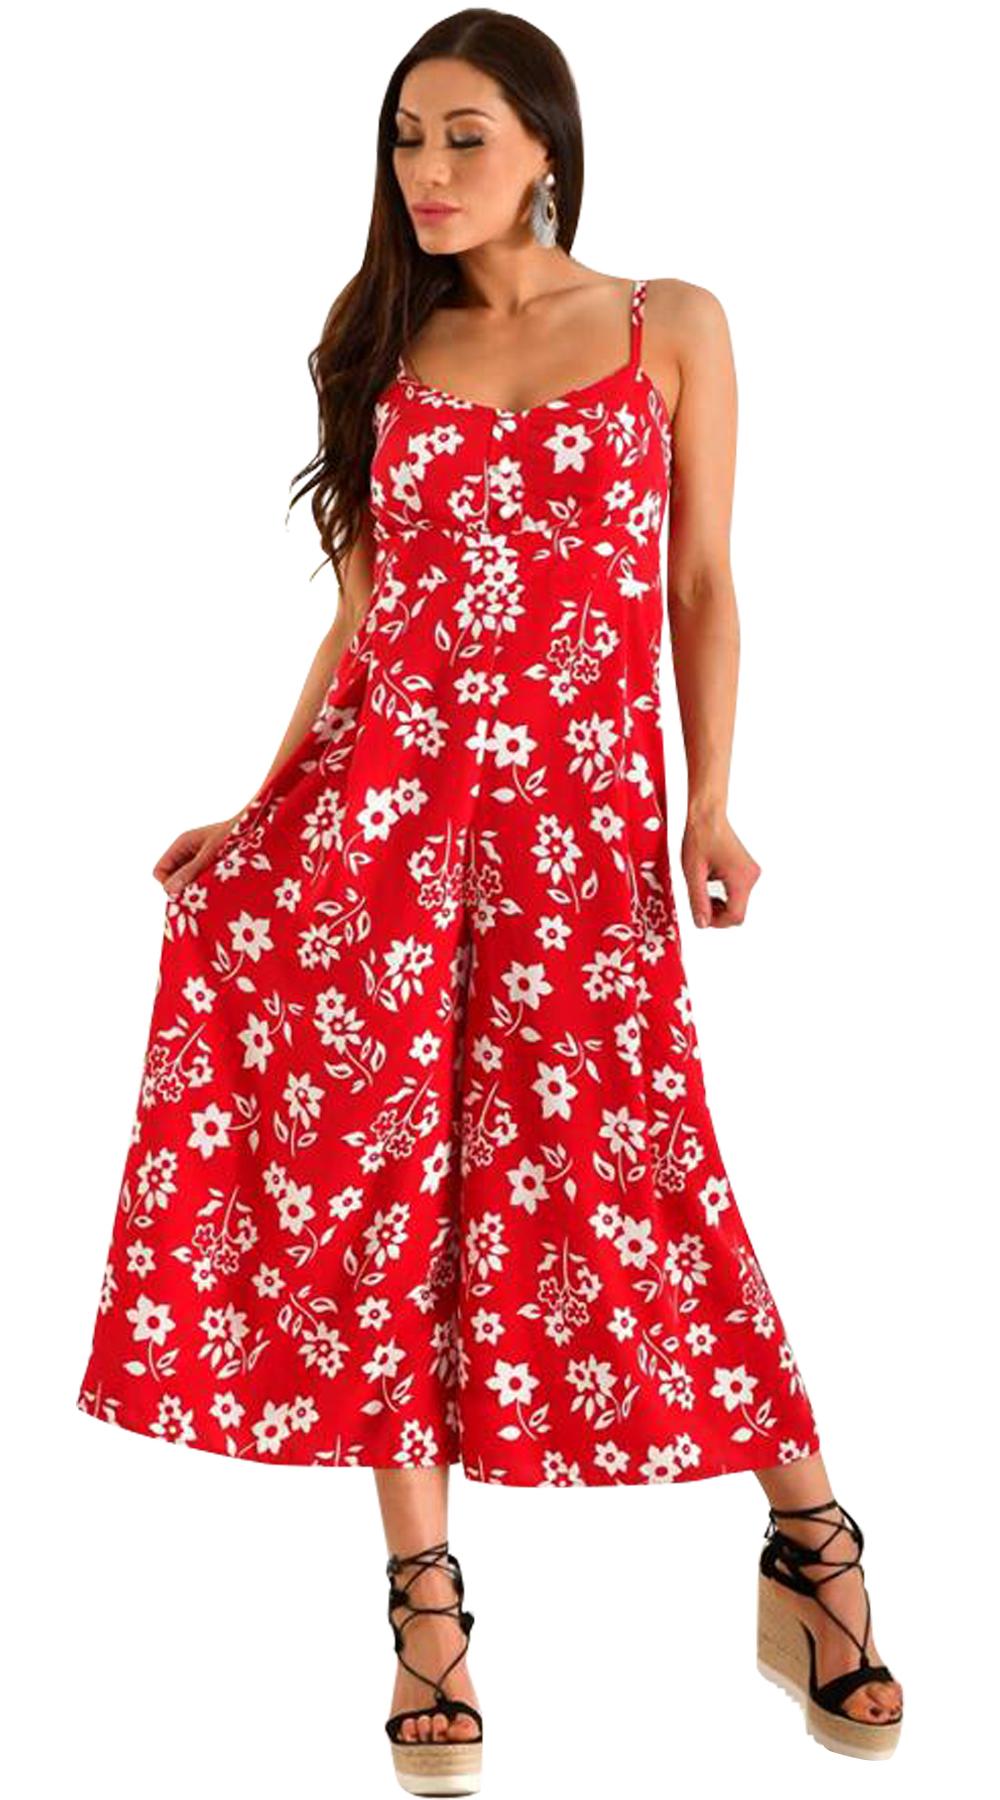 Girly φλοράλ ολόσωμη φόρμα με ζιπ κιλότ τελείωμα - LOVE ME - S18LV-280390 top trends φλοράλ